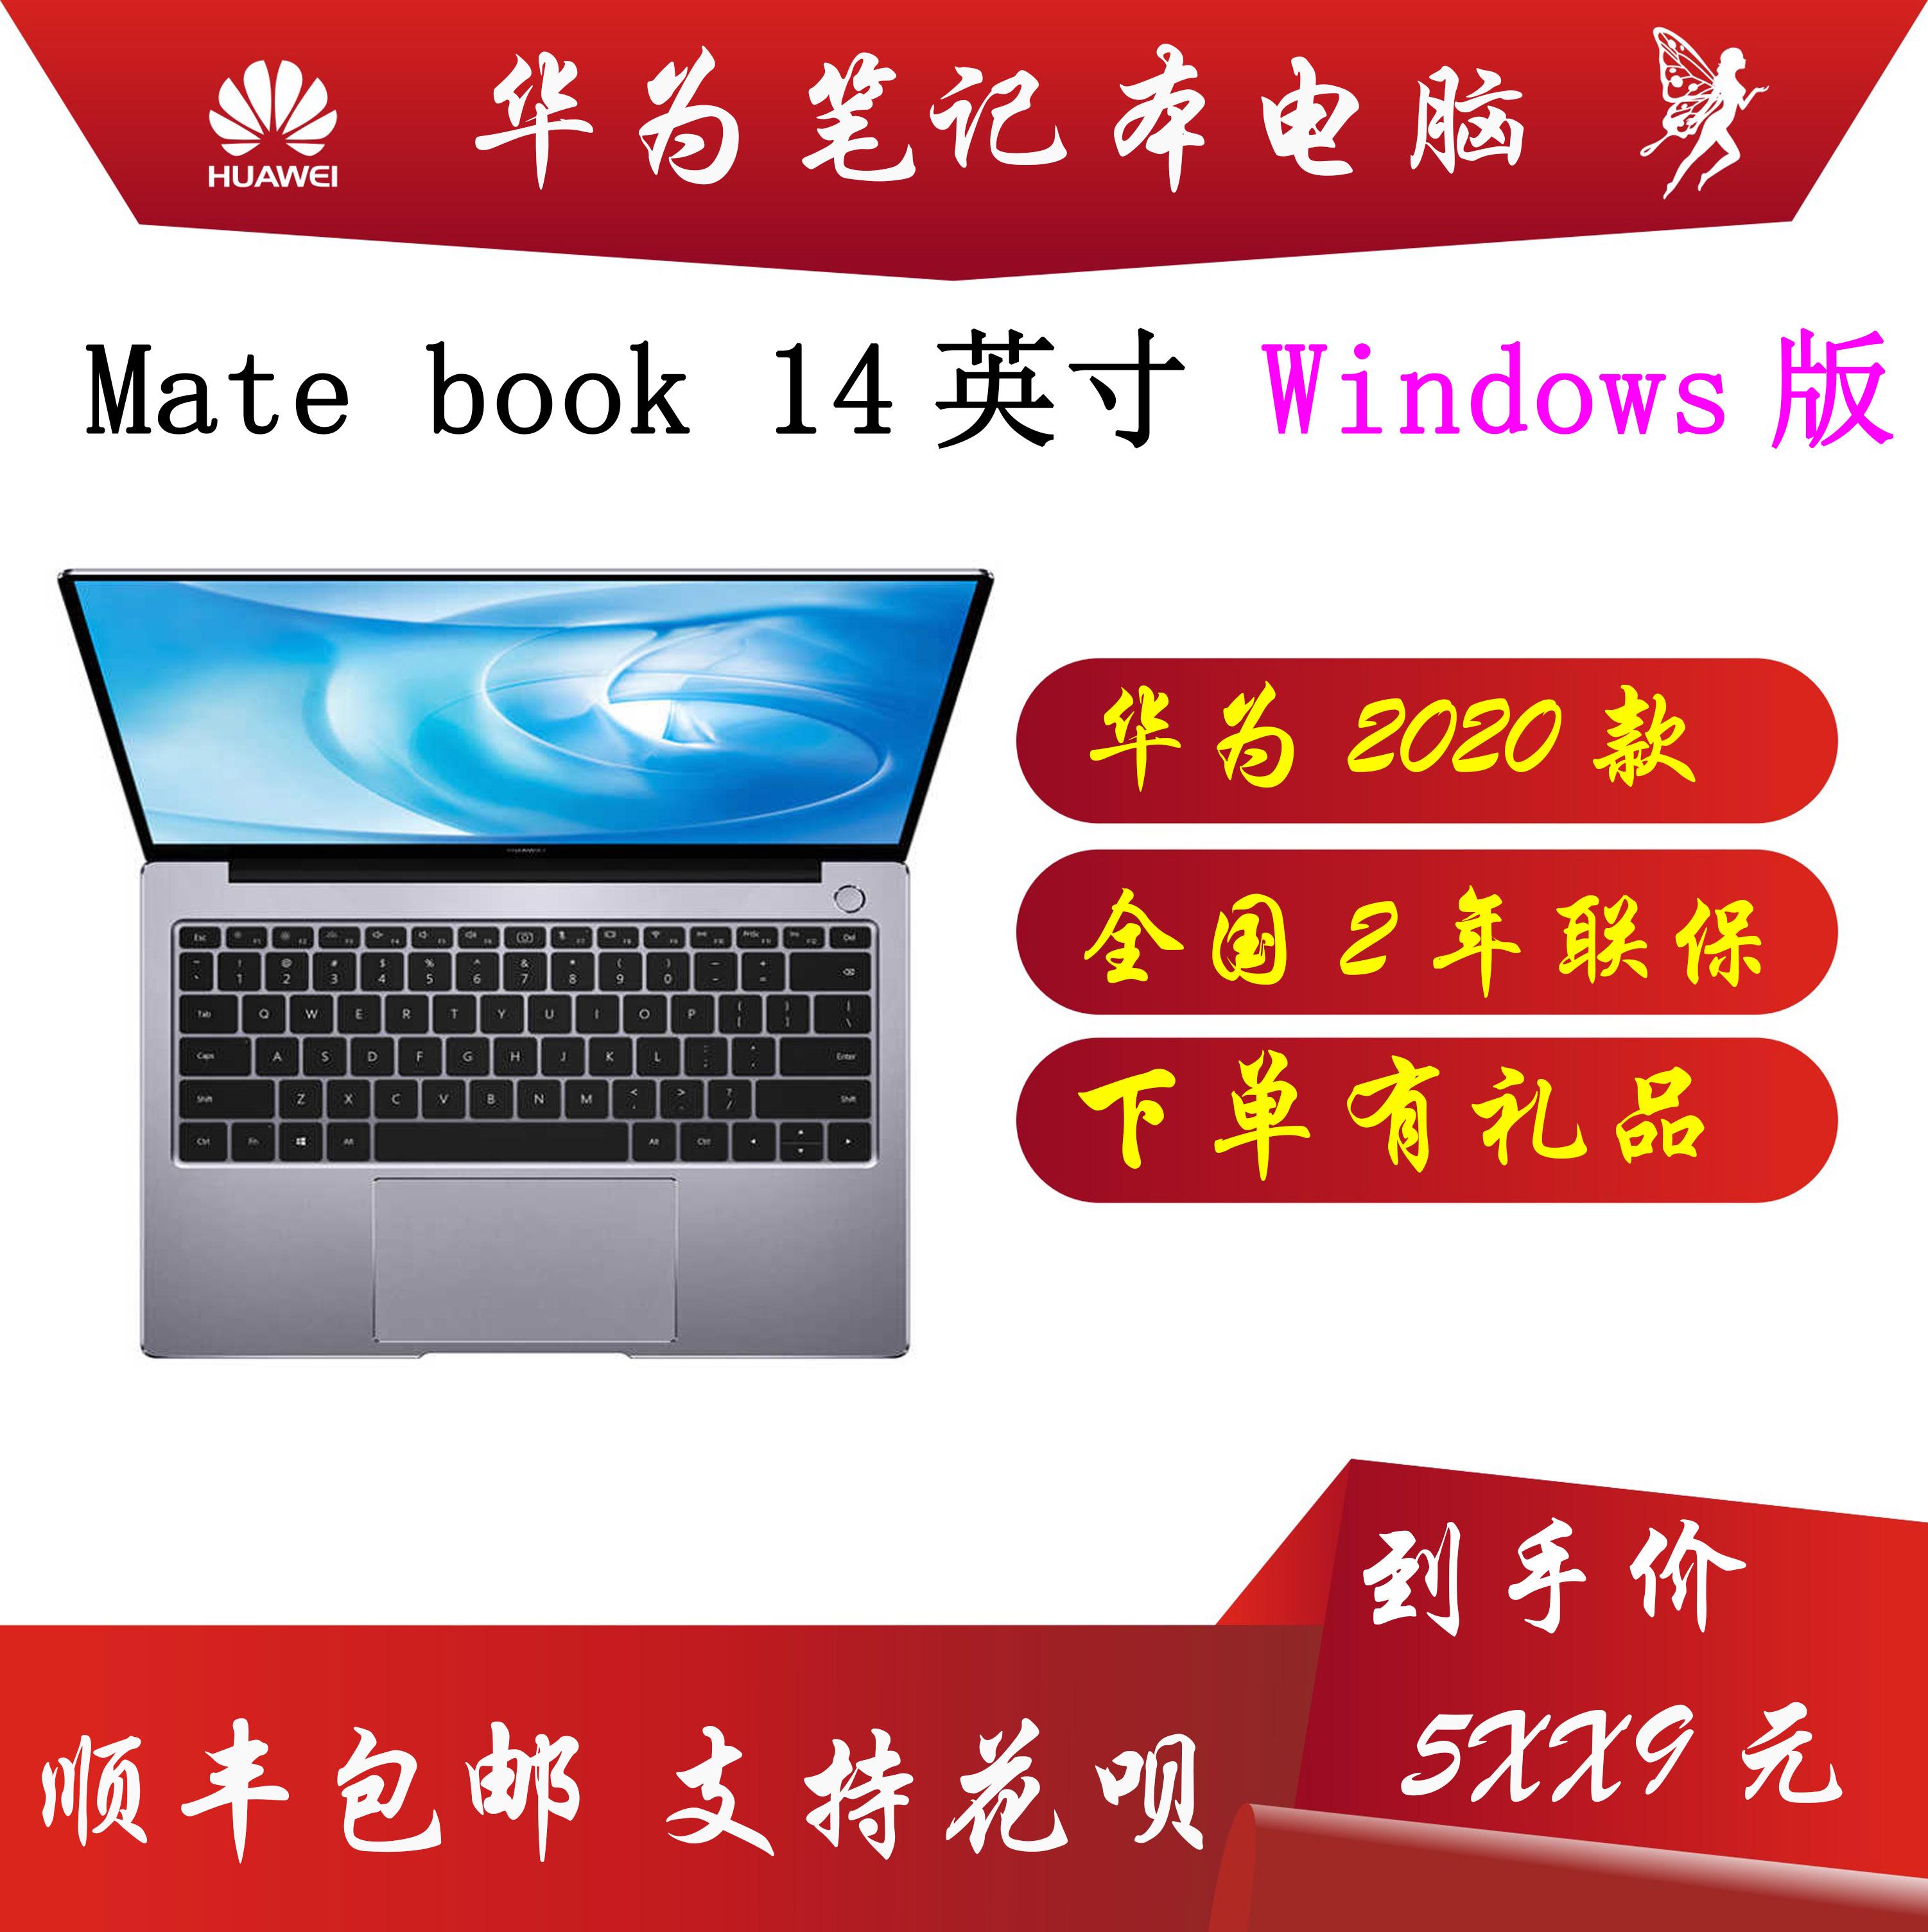 Huawei/ファーウェイMatebook 14 Klvc-WAH 9 L